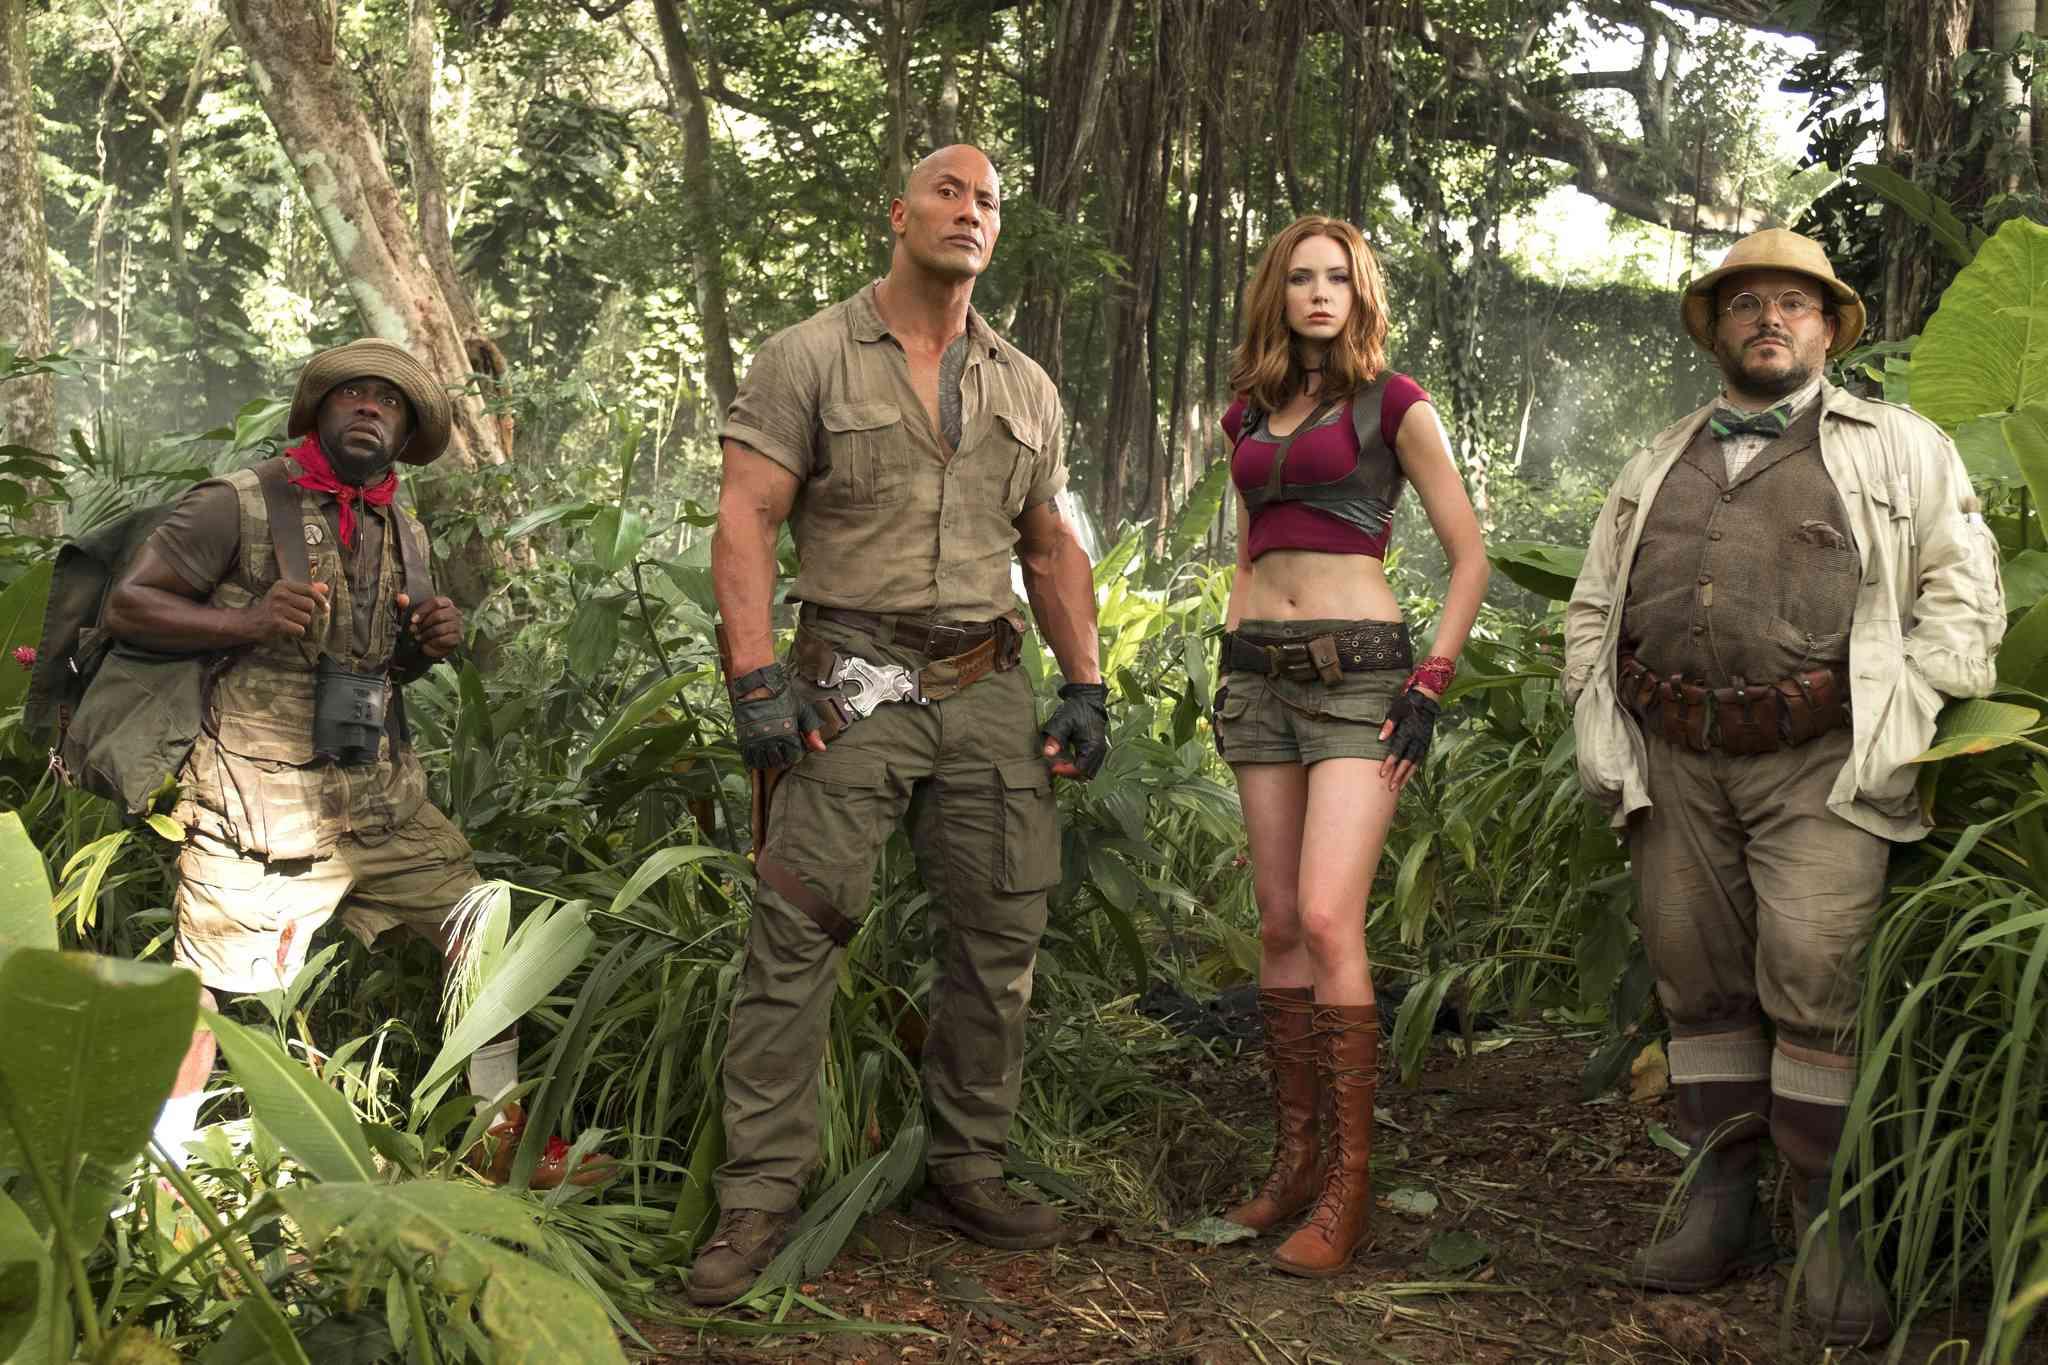 Kevin Hart, Dwayne Johnson, Karen Gillan and Jack Black in Jumanji: Welcome to the Jungle (2017)